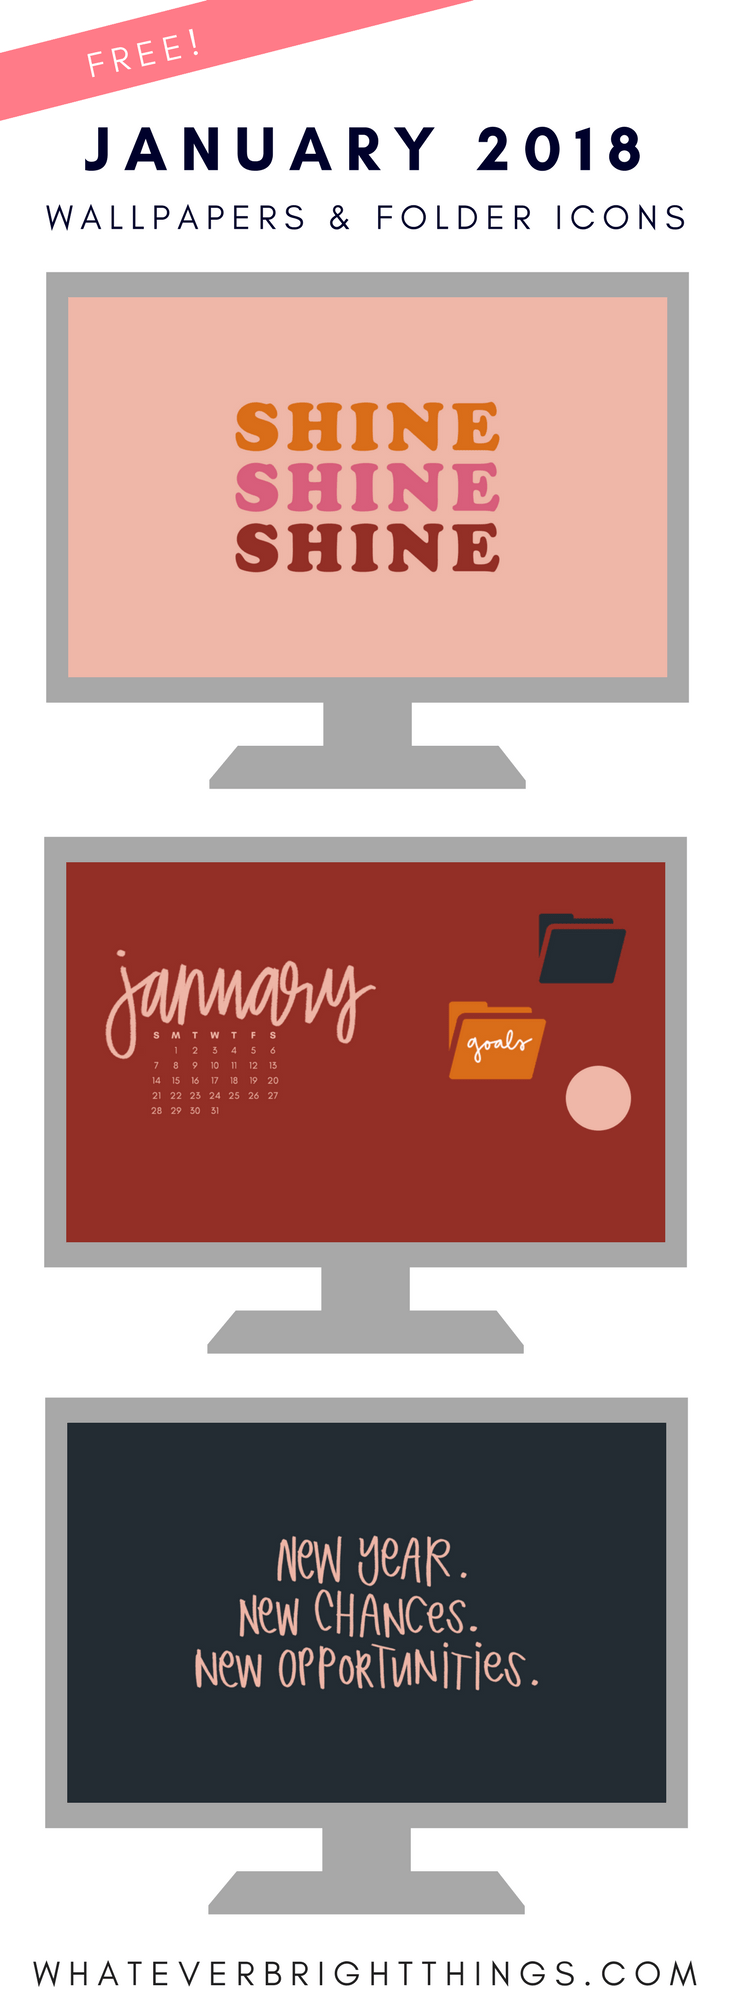 January 2018 Wallpapers & Folder Icons Folder icon